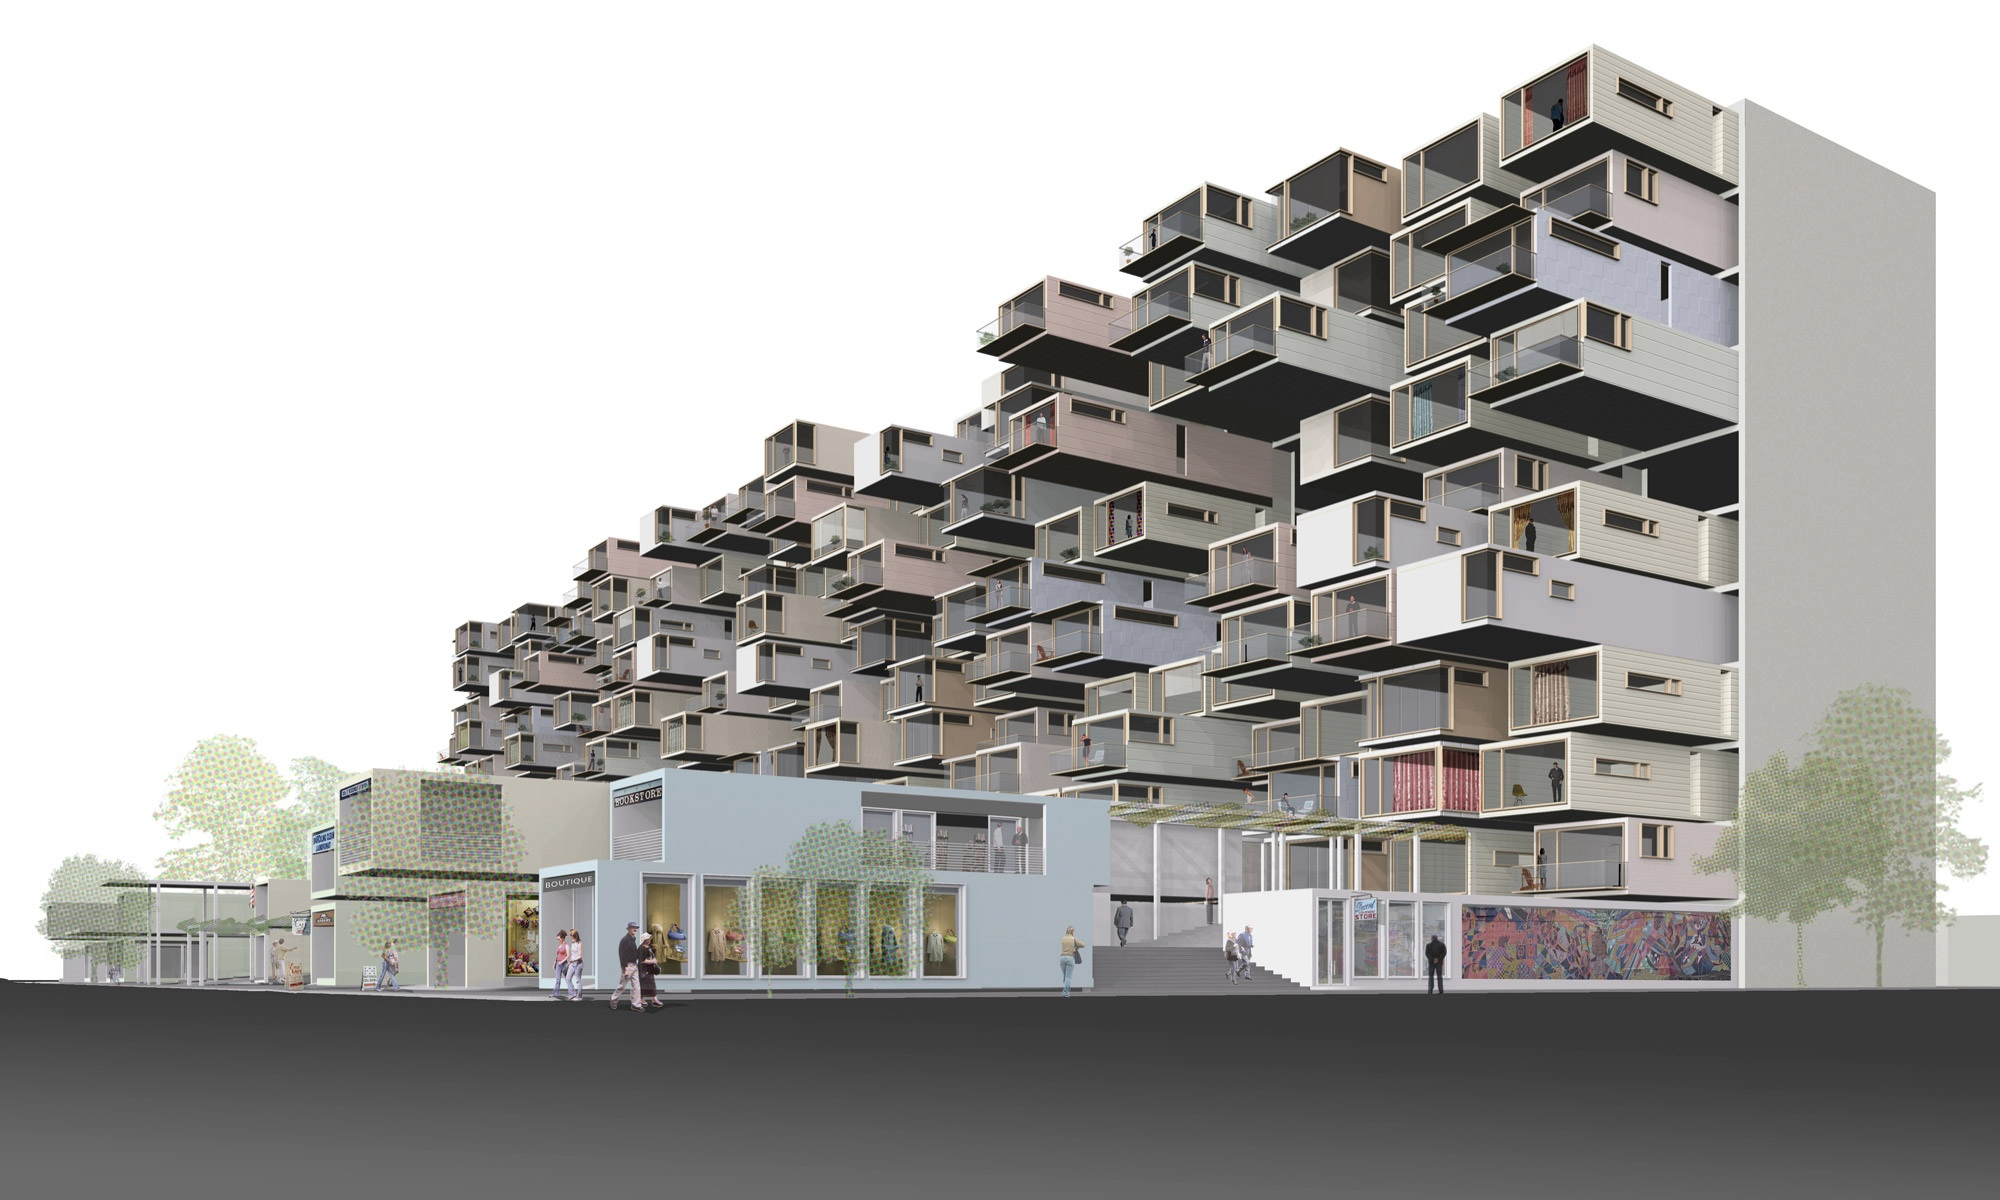 Datei:Katrina Design Competition.jpg – Wikipedia